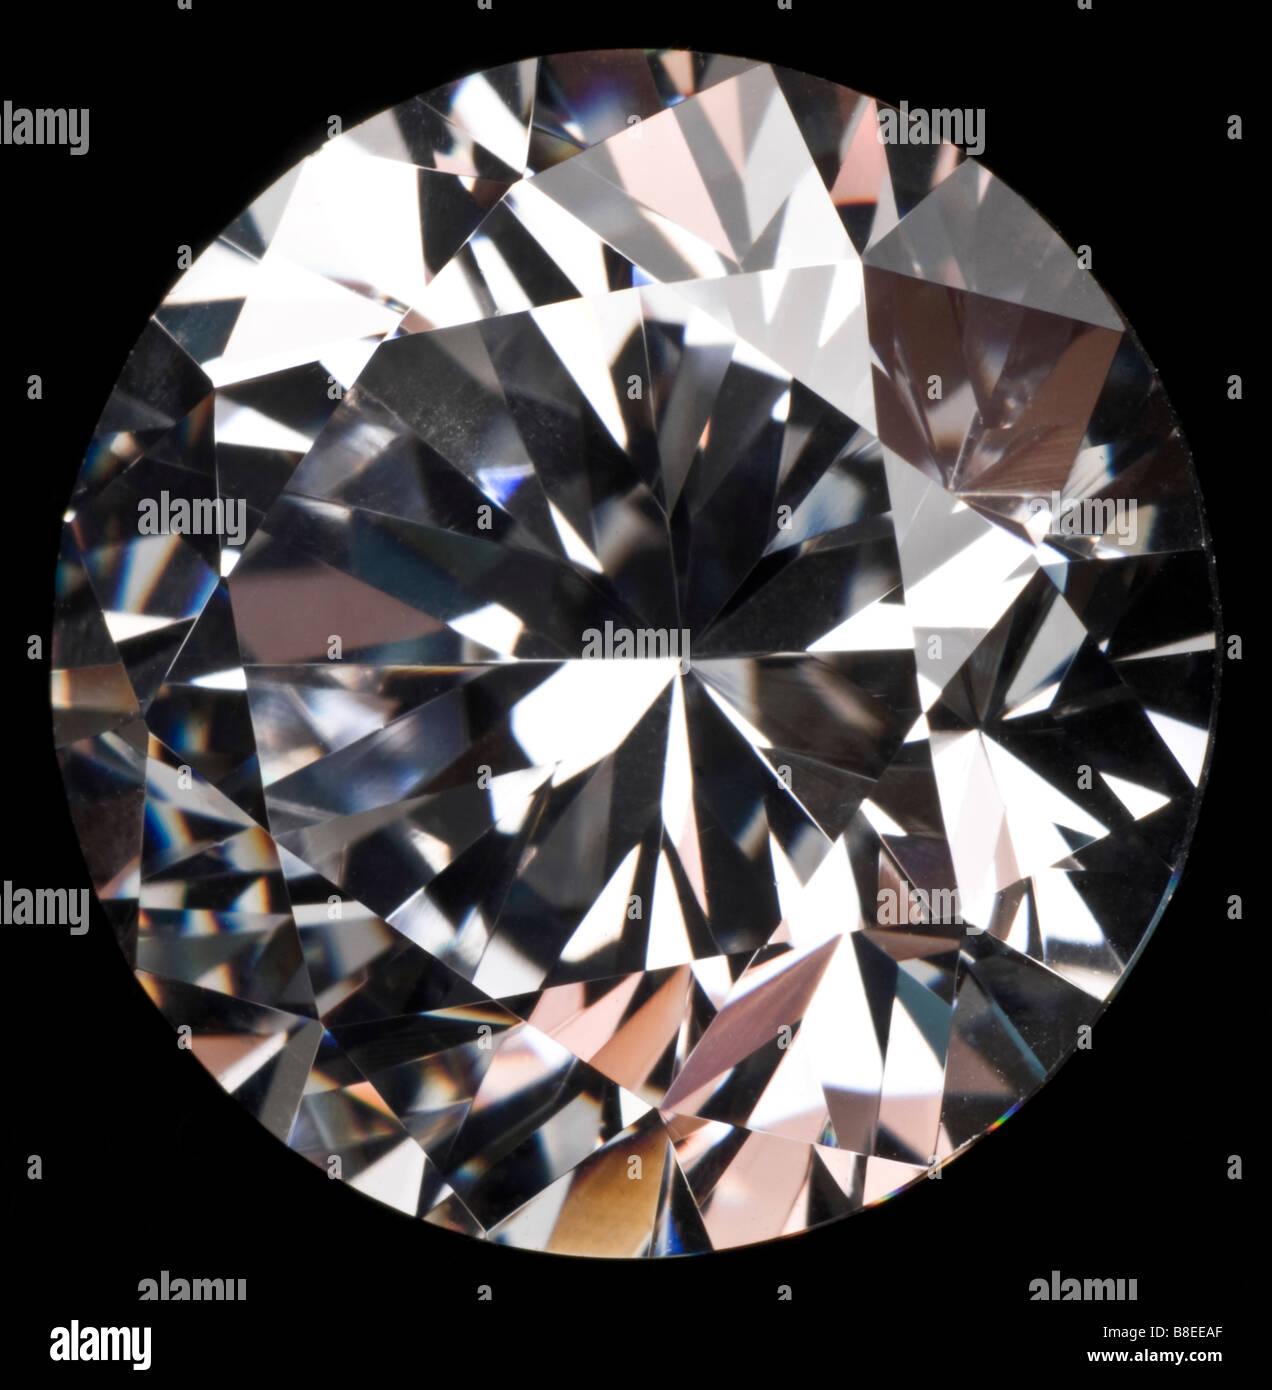 Round cut Diamond (Synthetic Cubic-Zirconia) - Stock Image